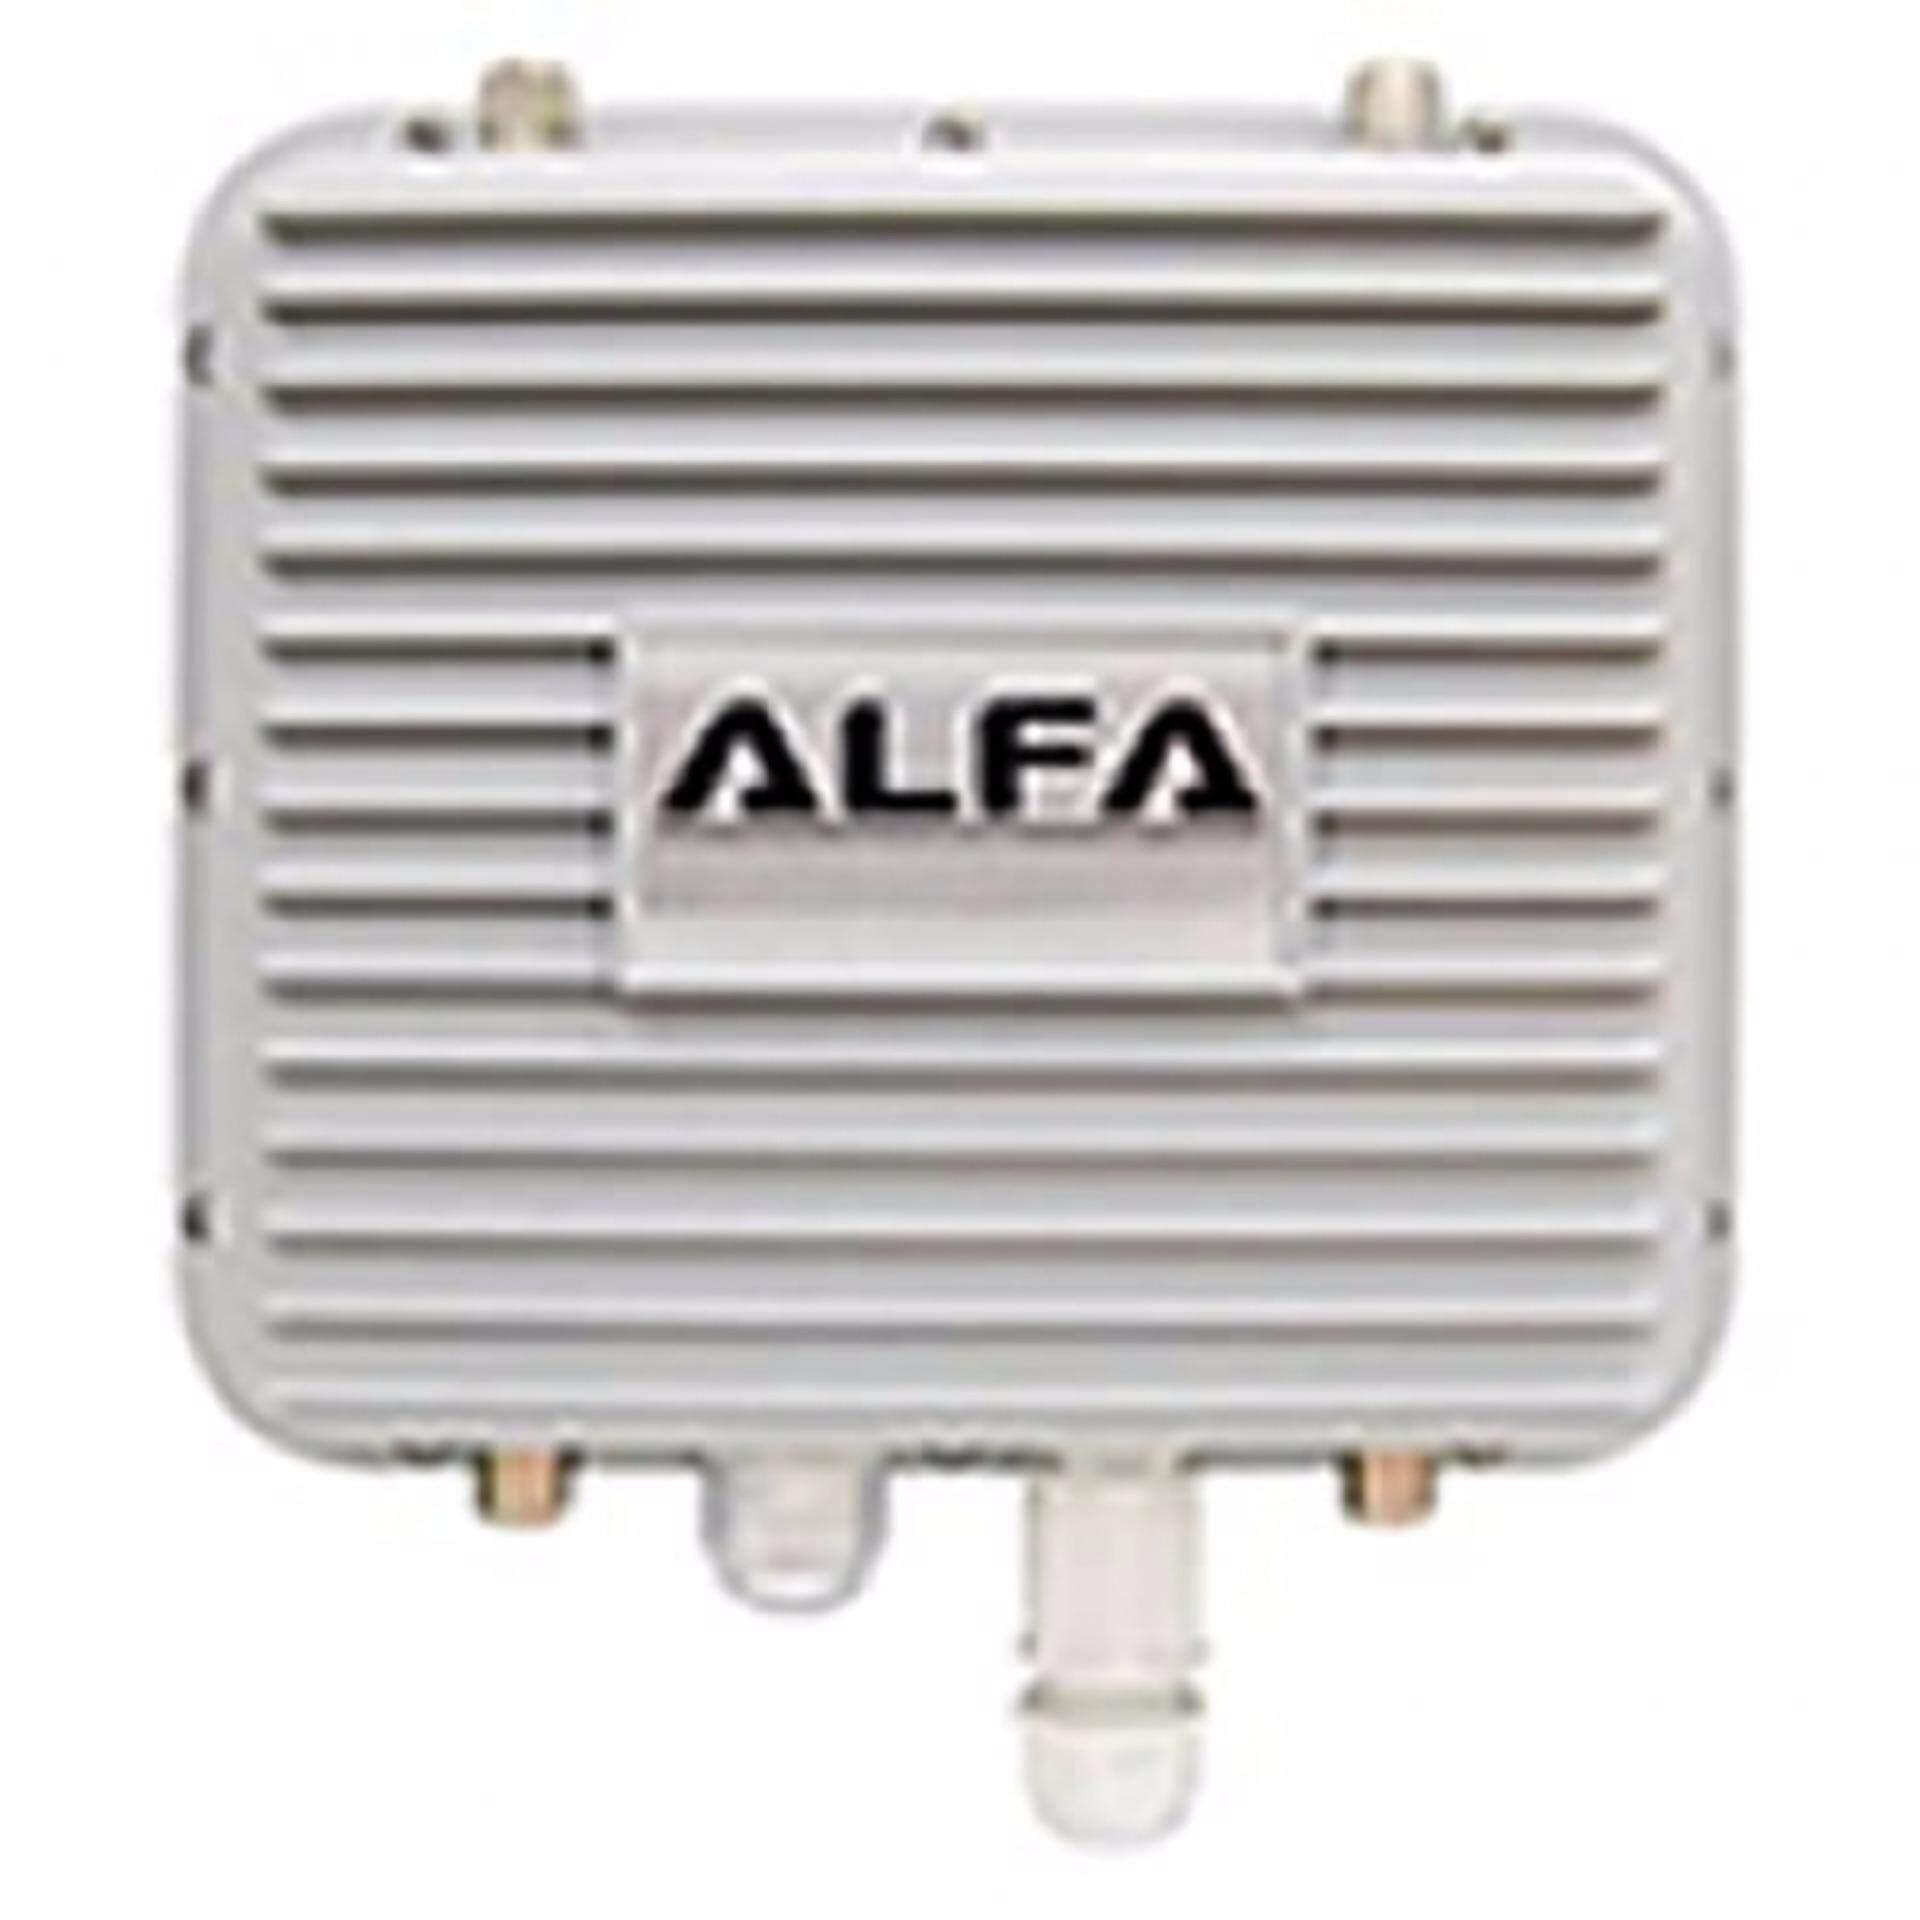 Alfa Network MatrixPro Out door Wifi AP or  Powerful Hot spot